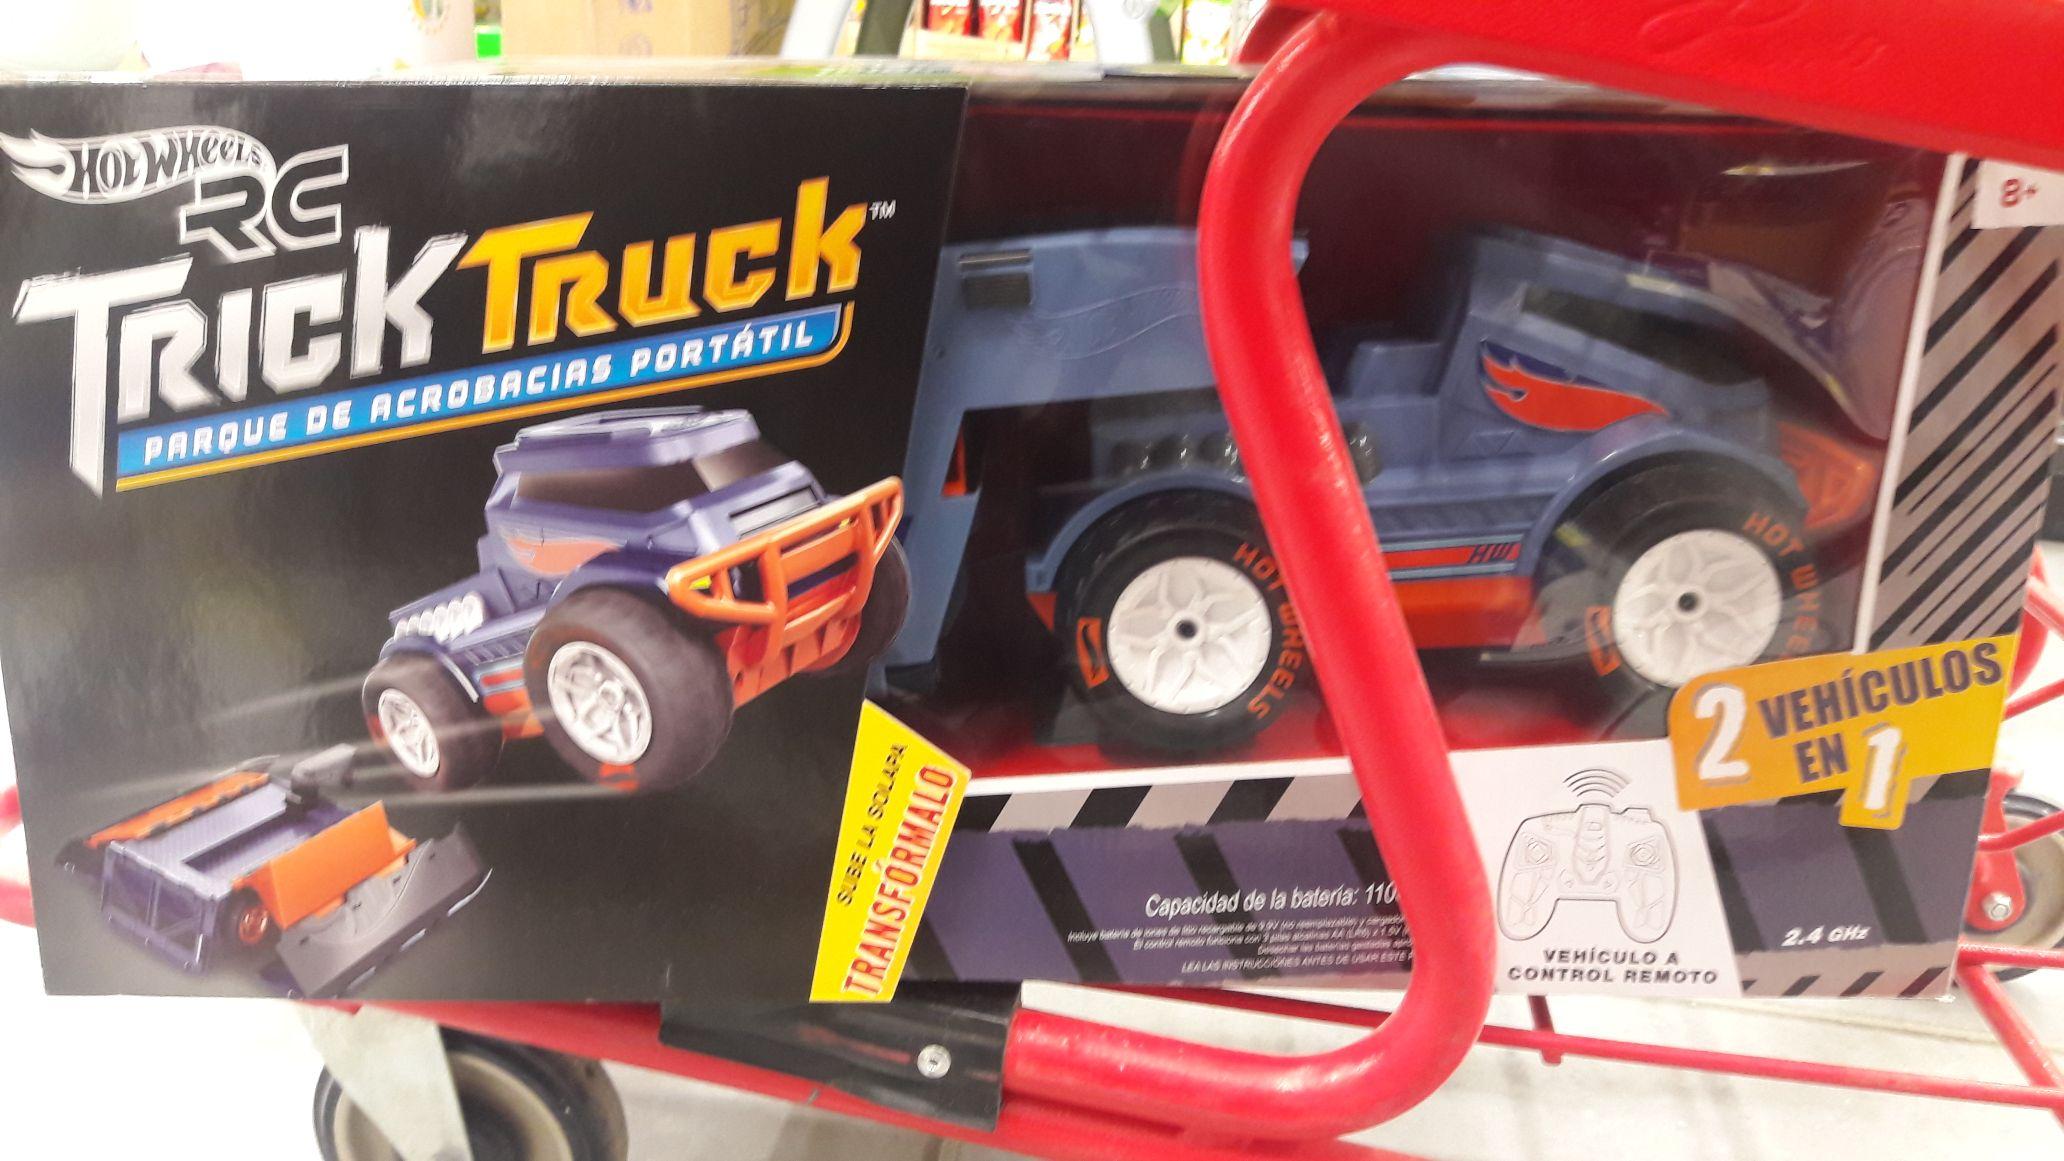 Bodega Aurrera: Trick Truck parque de acrobacias.